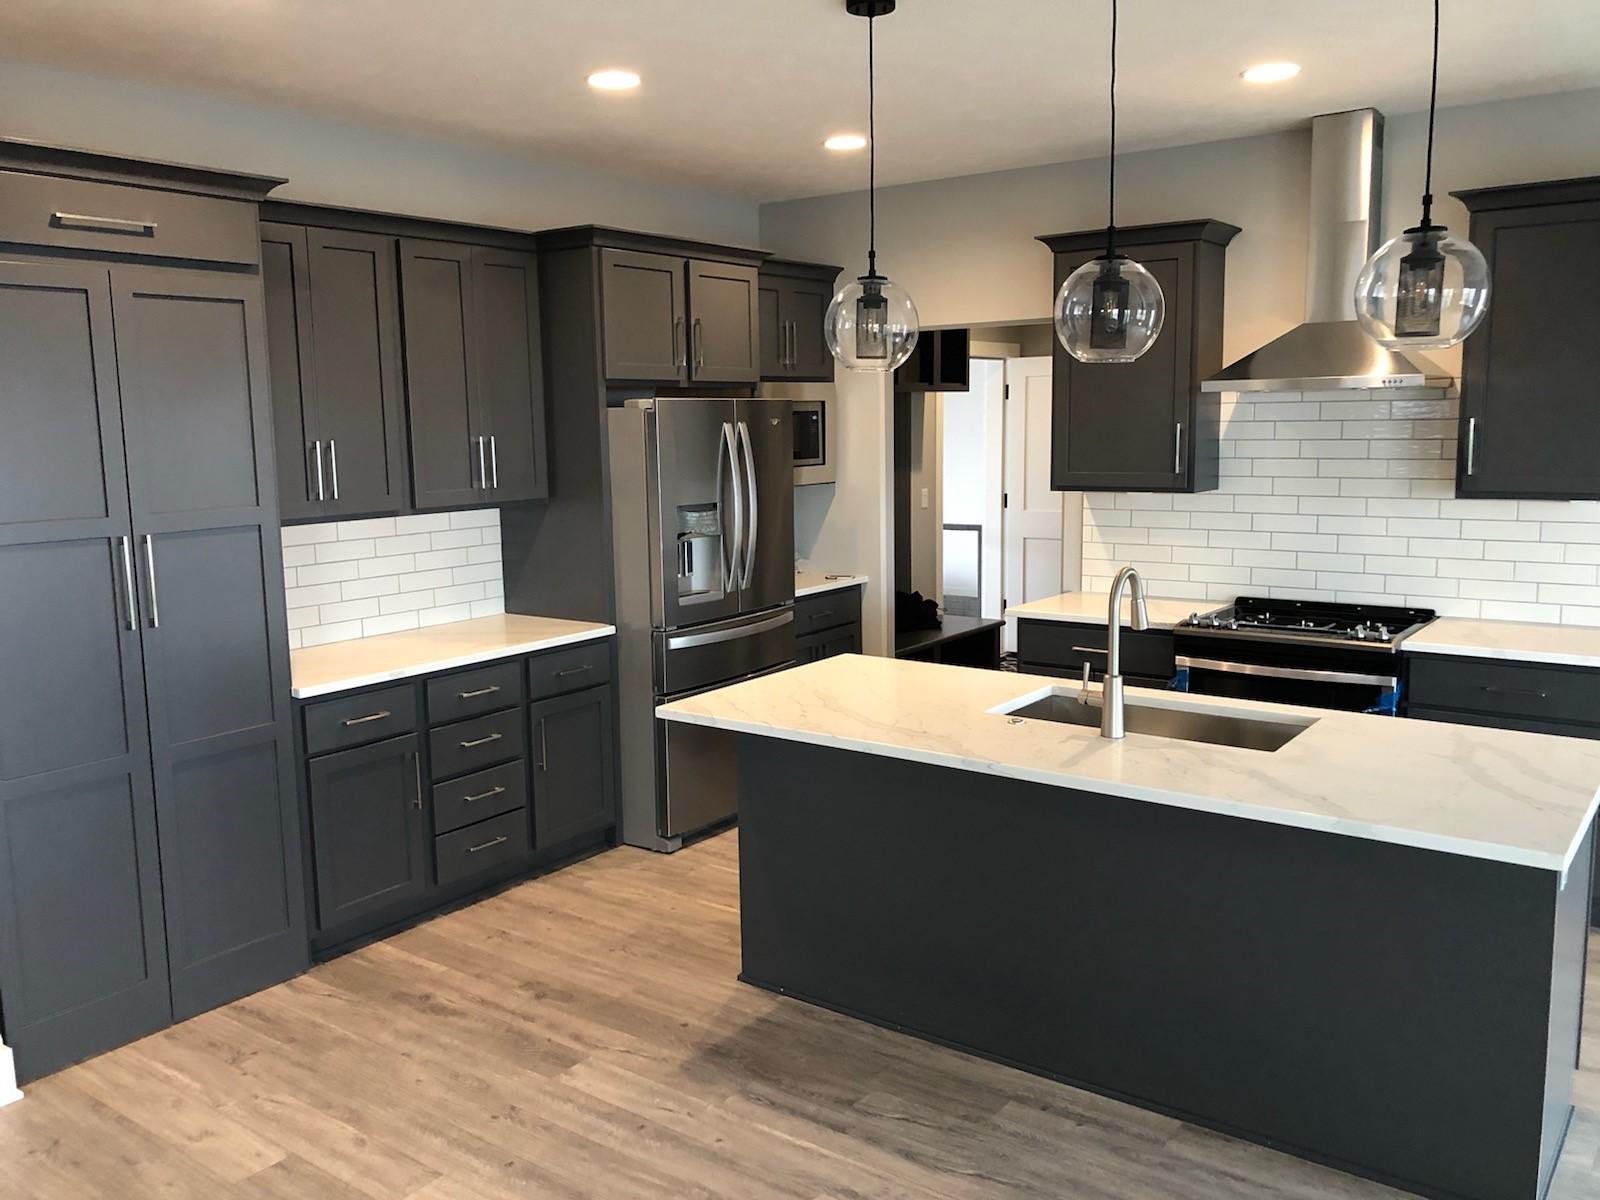 cadwell kitchen 4.jpg